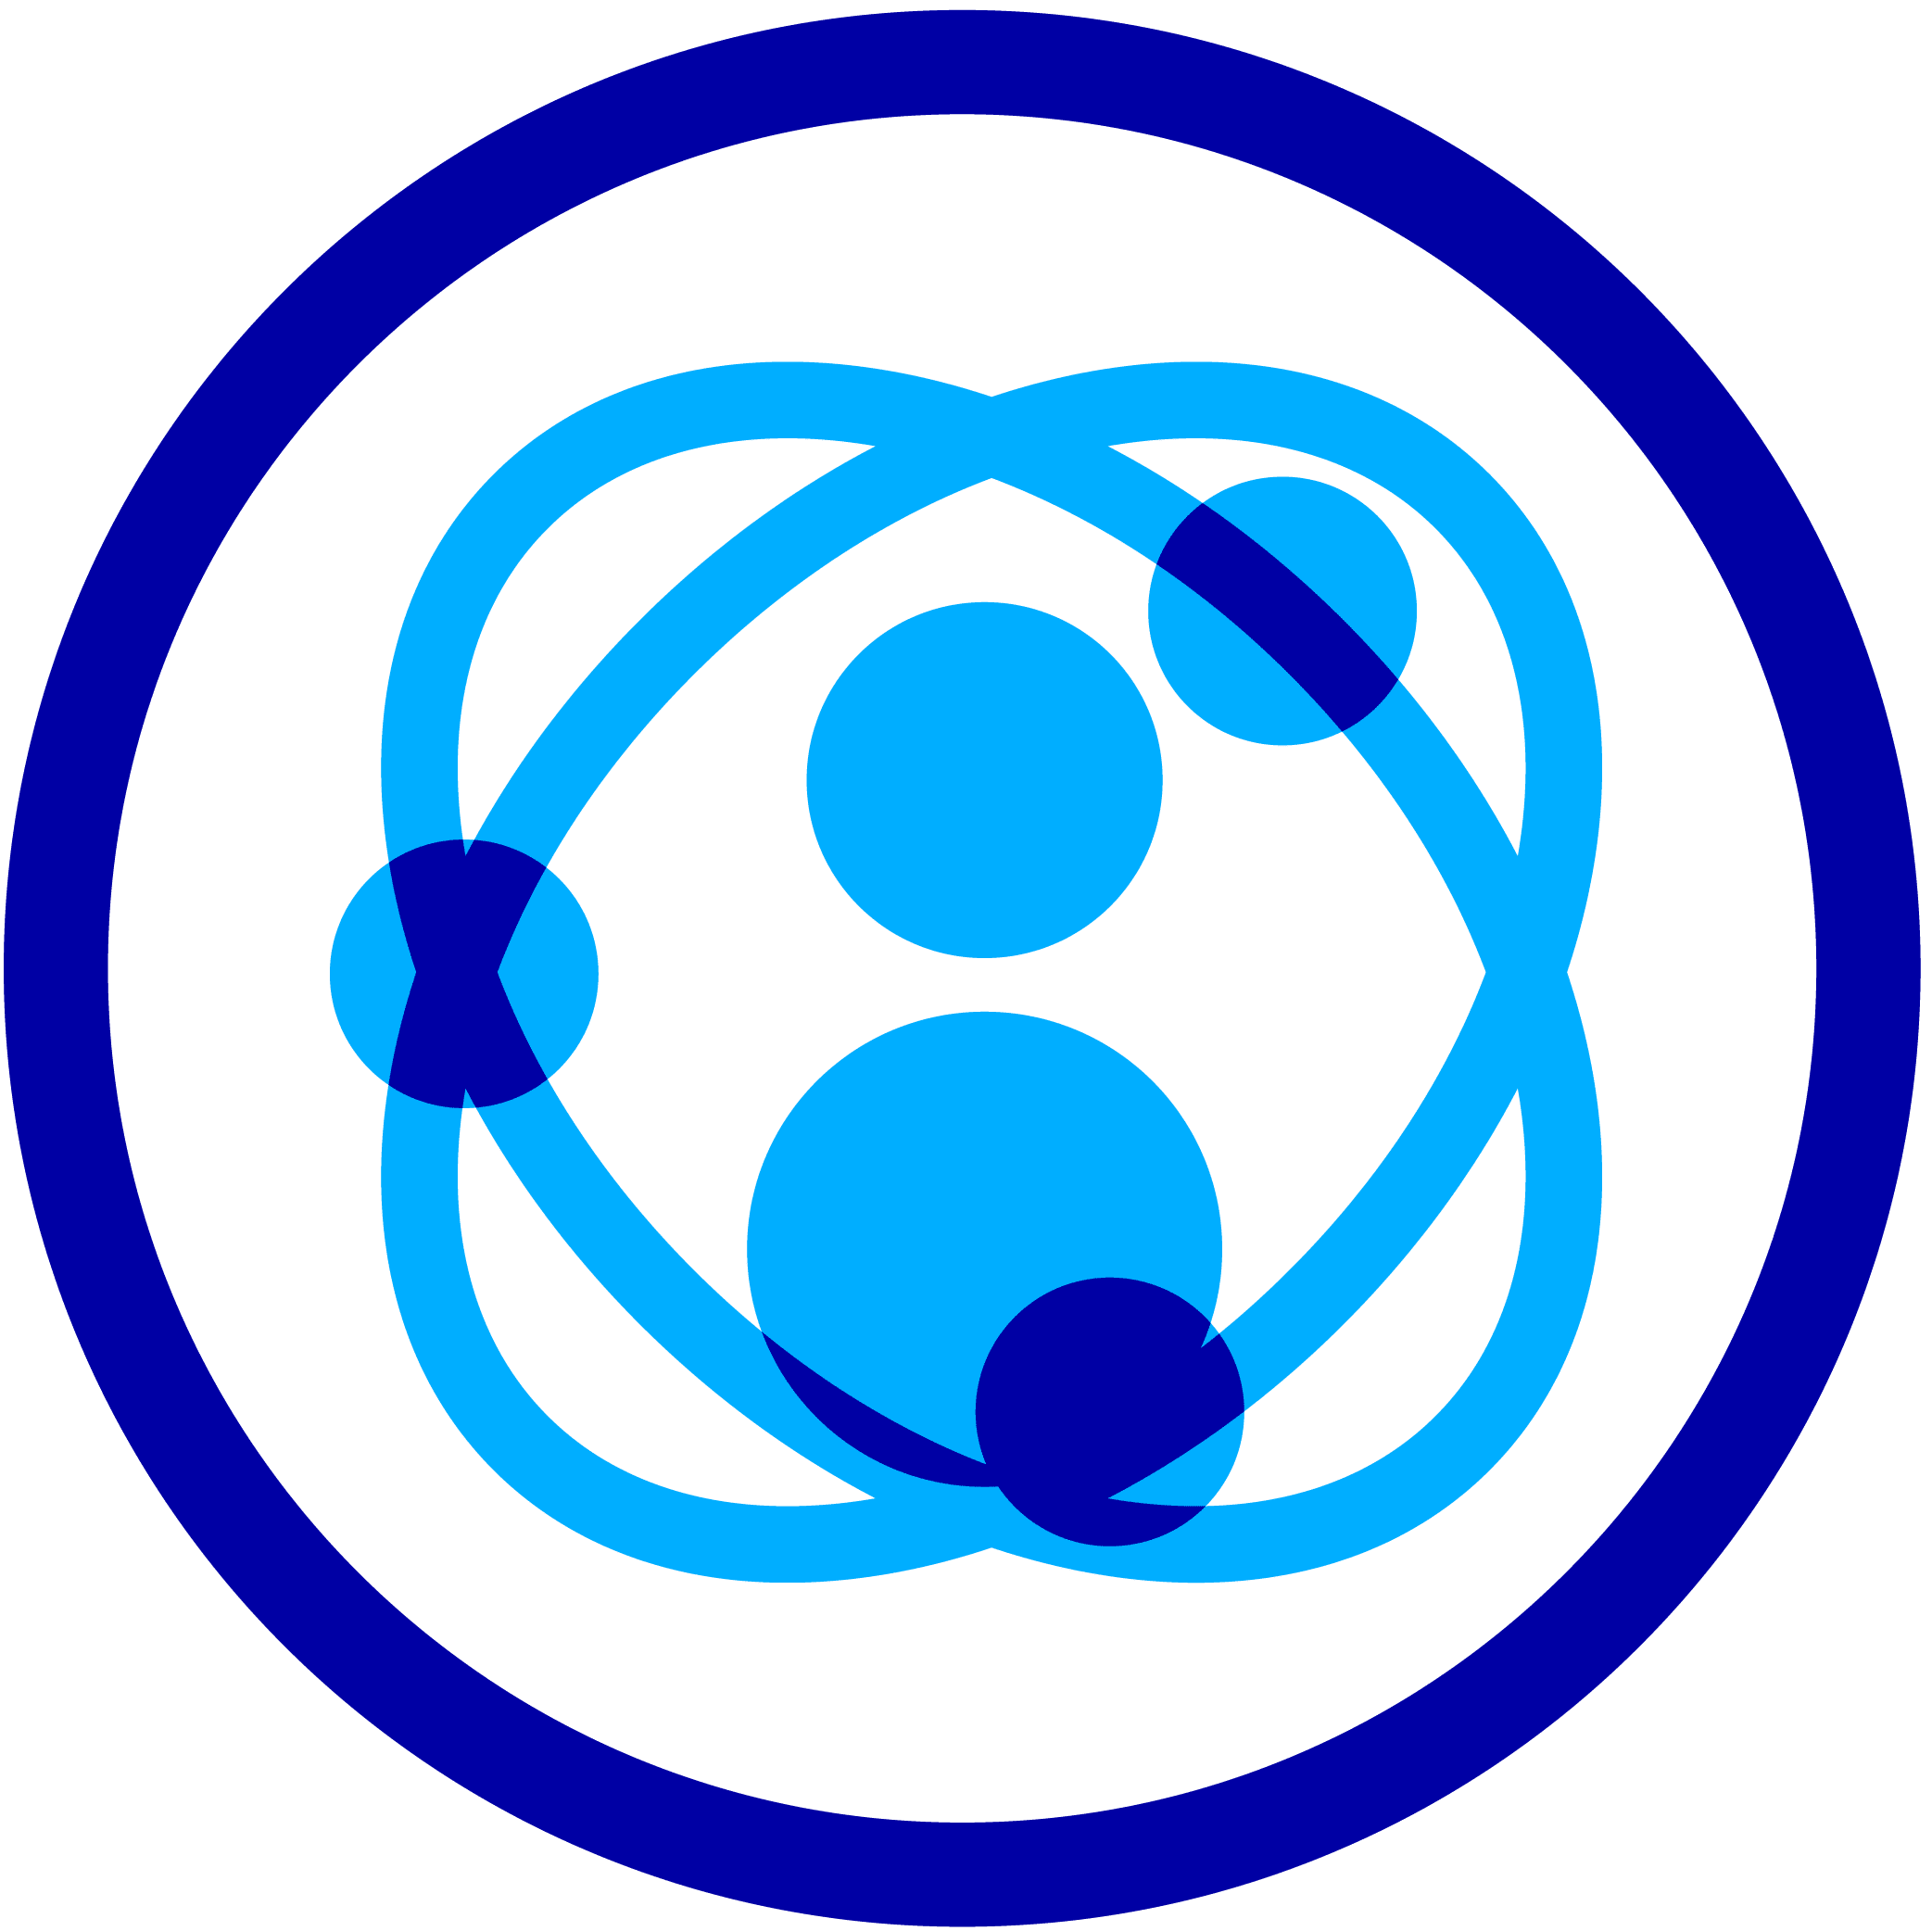 https://uk.fi-group.com/wp-content/uploads/sites/7/2021/02/blue-icons-set_1-55.png